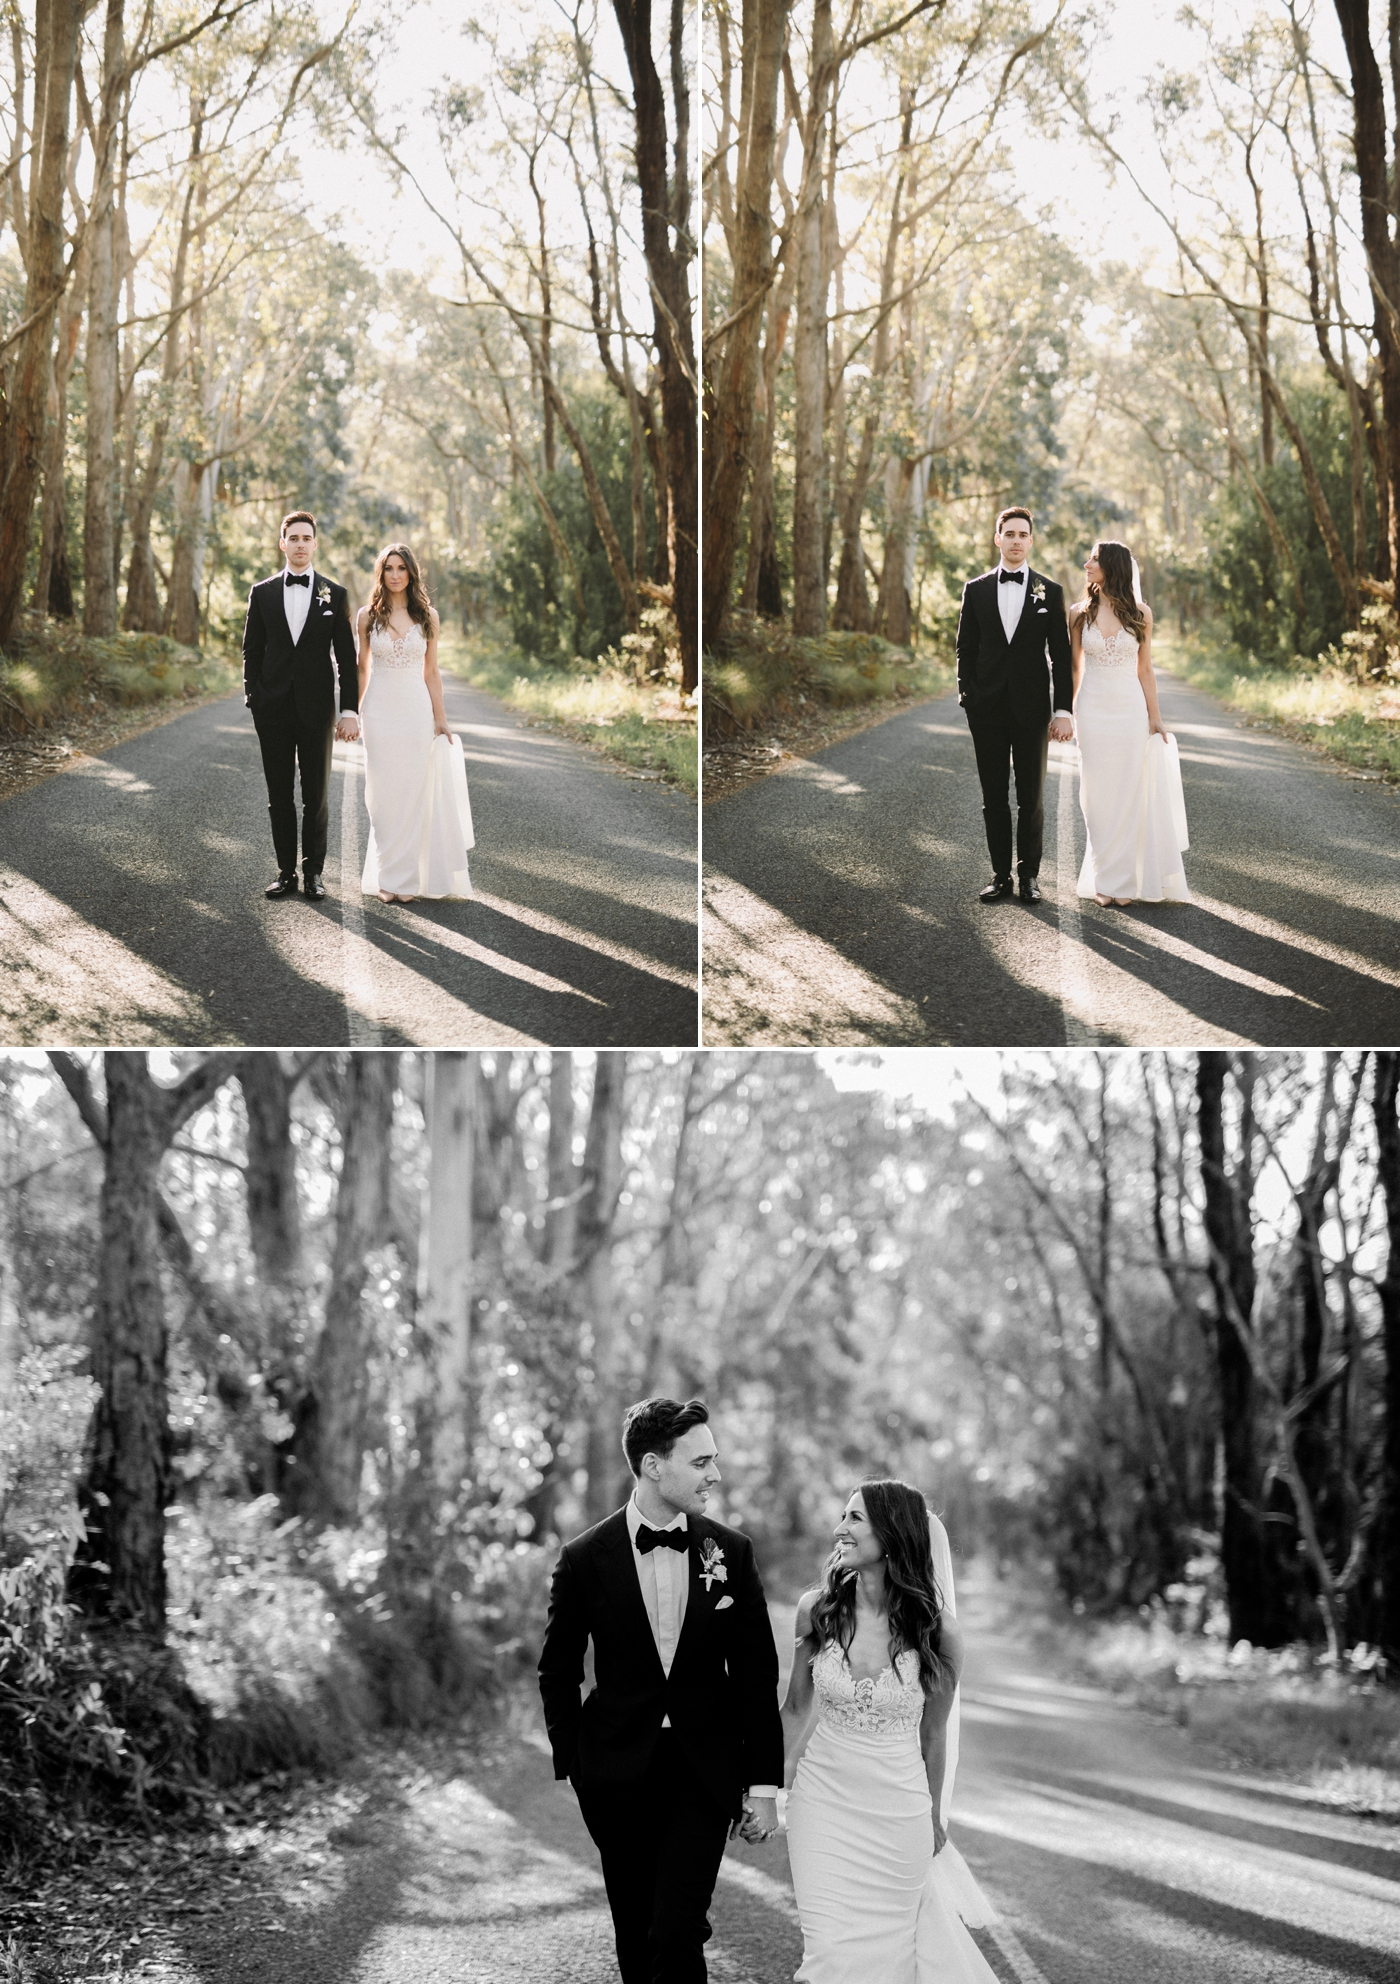 Katie and Ben - Natural Wedding Photography in Adelaide - Beautiful, Candid Wedding Photographer - Adelaide Hills Wedding - Katherine Schultz - www.katherineschultzphotography.com_0055.jpg